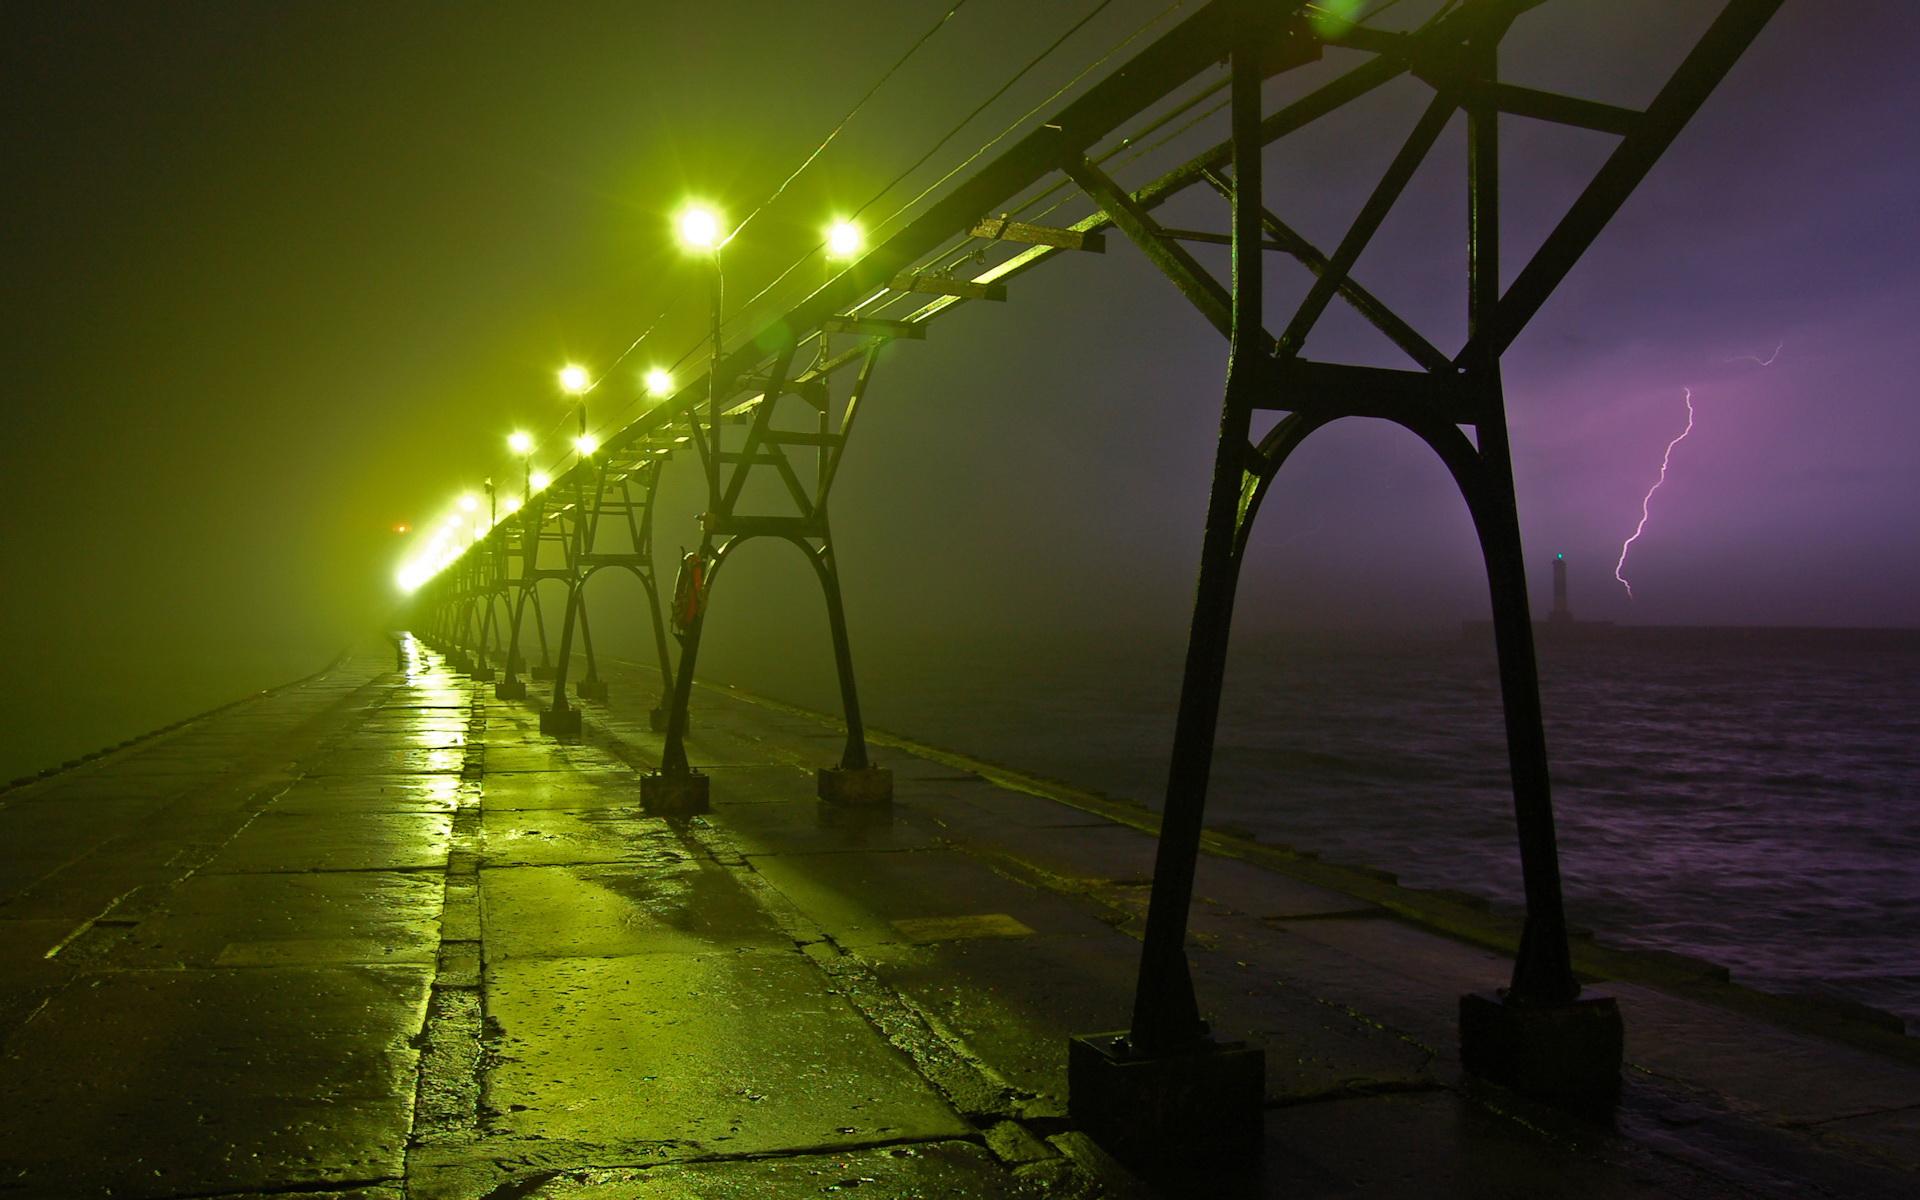 Stock Image of Rainy Street